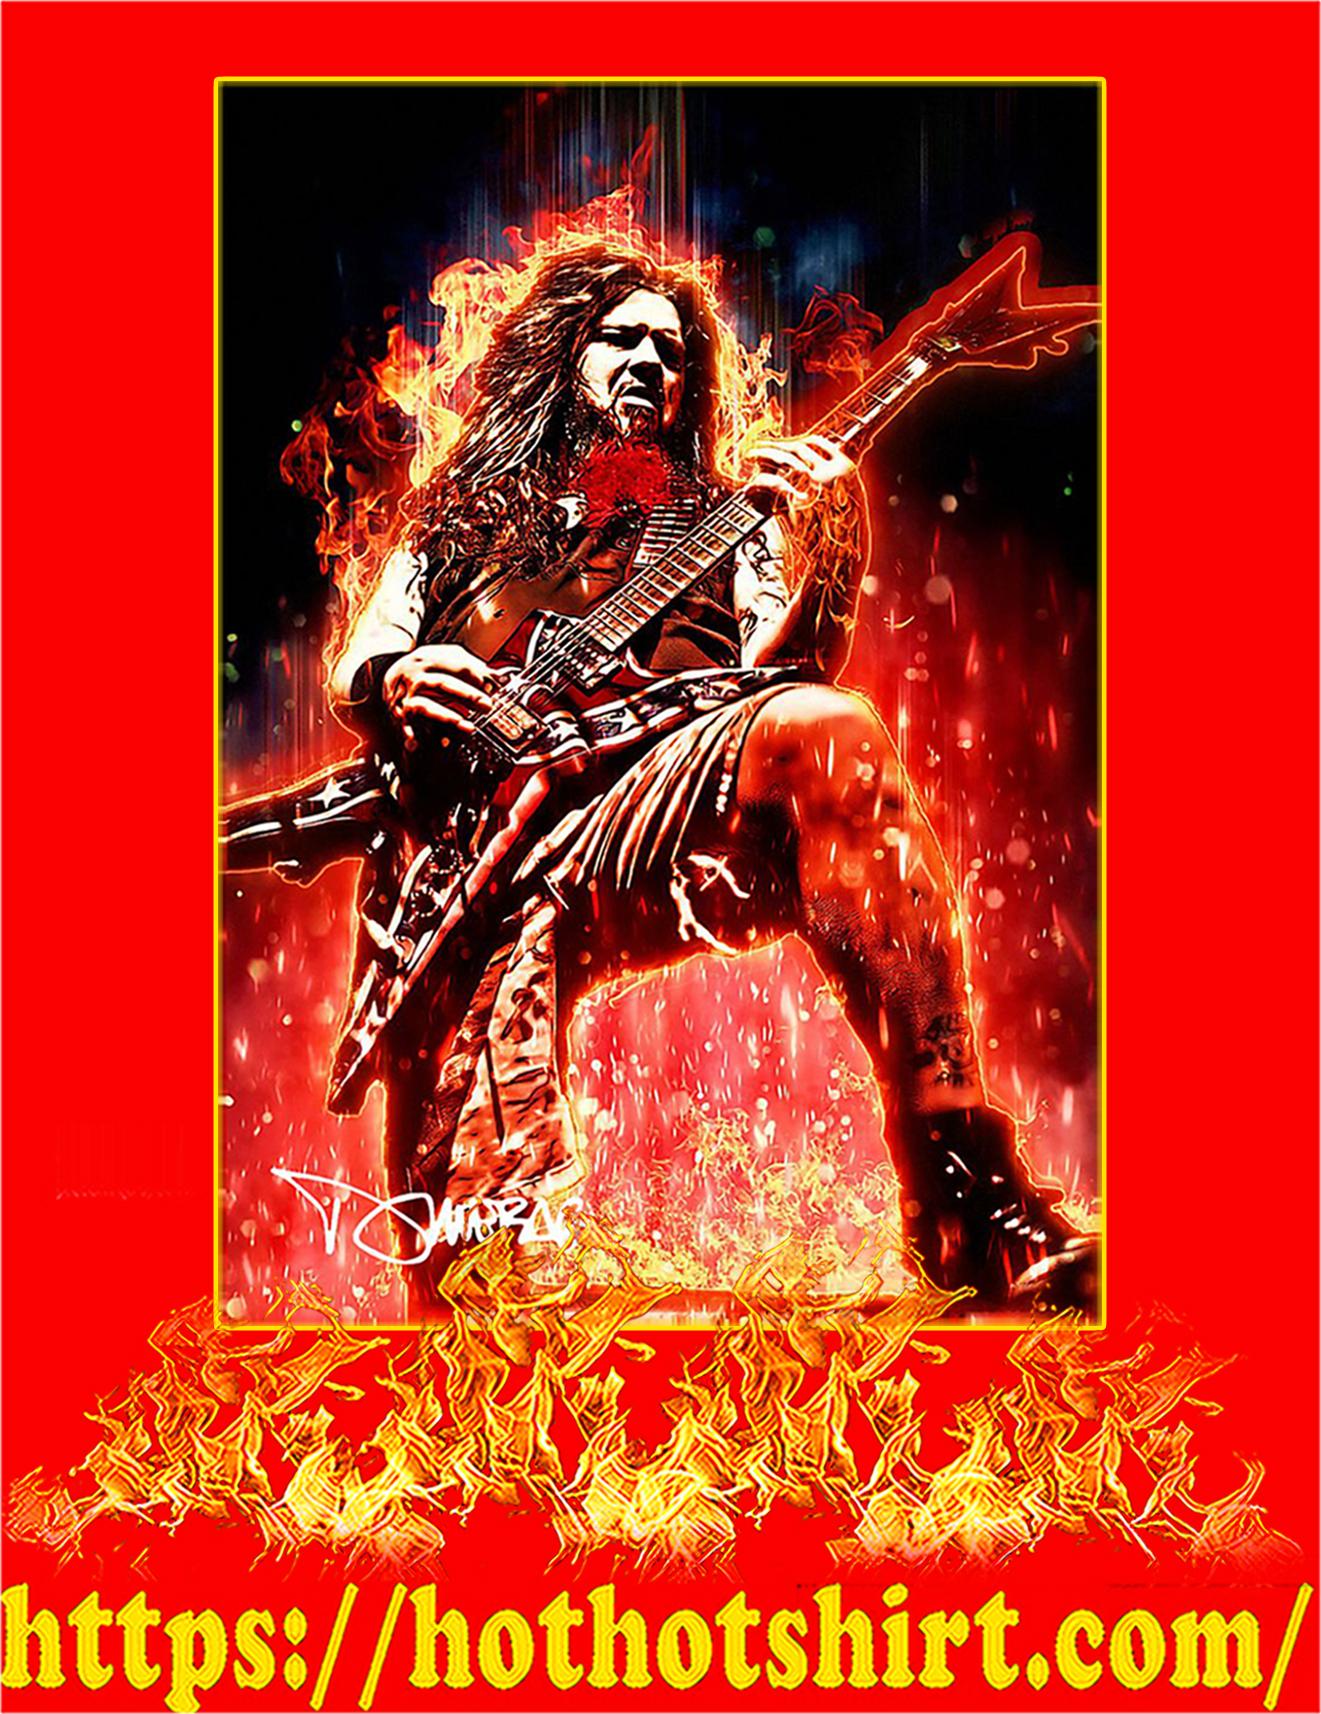 Legendary Dimebag Darrell Signature Poster - A3